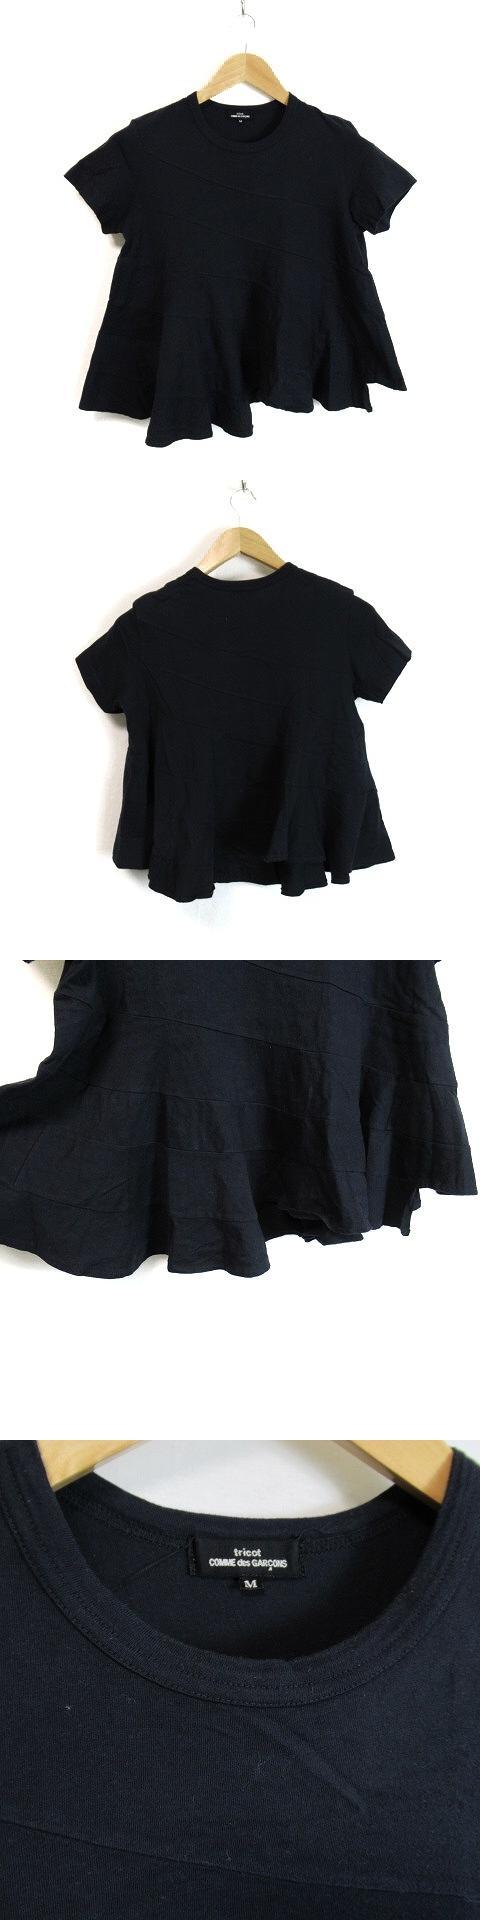 Tシャツ カットソー 半袖 コットン イレギュラーヘム M 紺 ネイビー